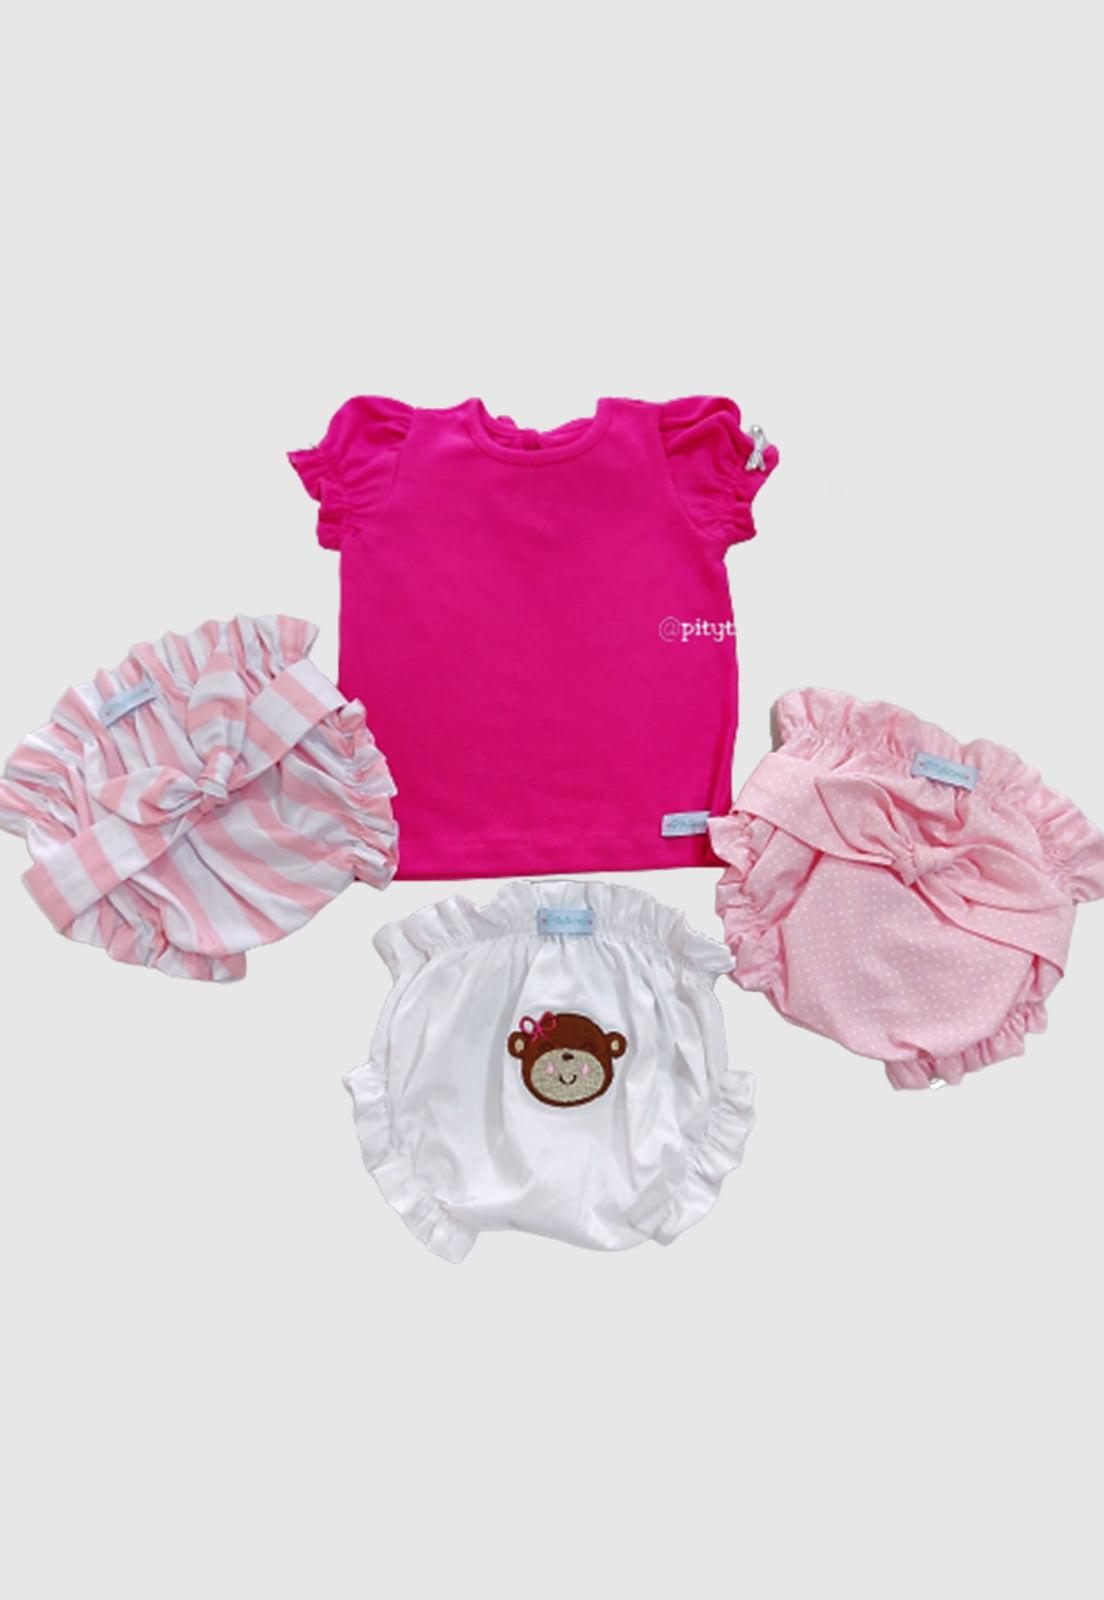 Combo Mamãe Ama - Pink Love